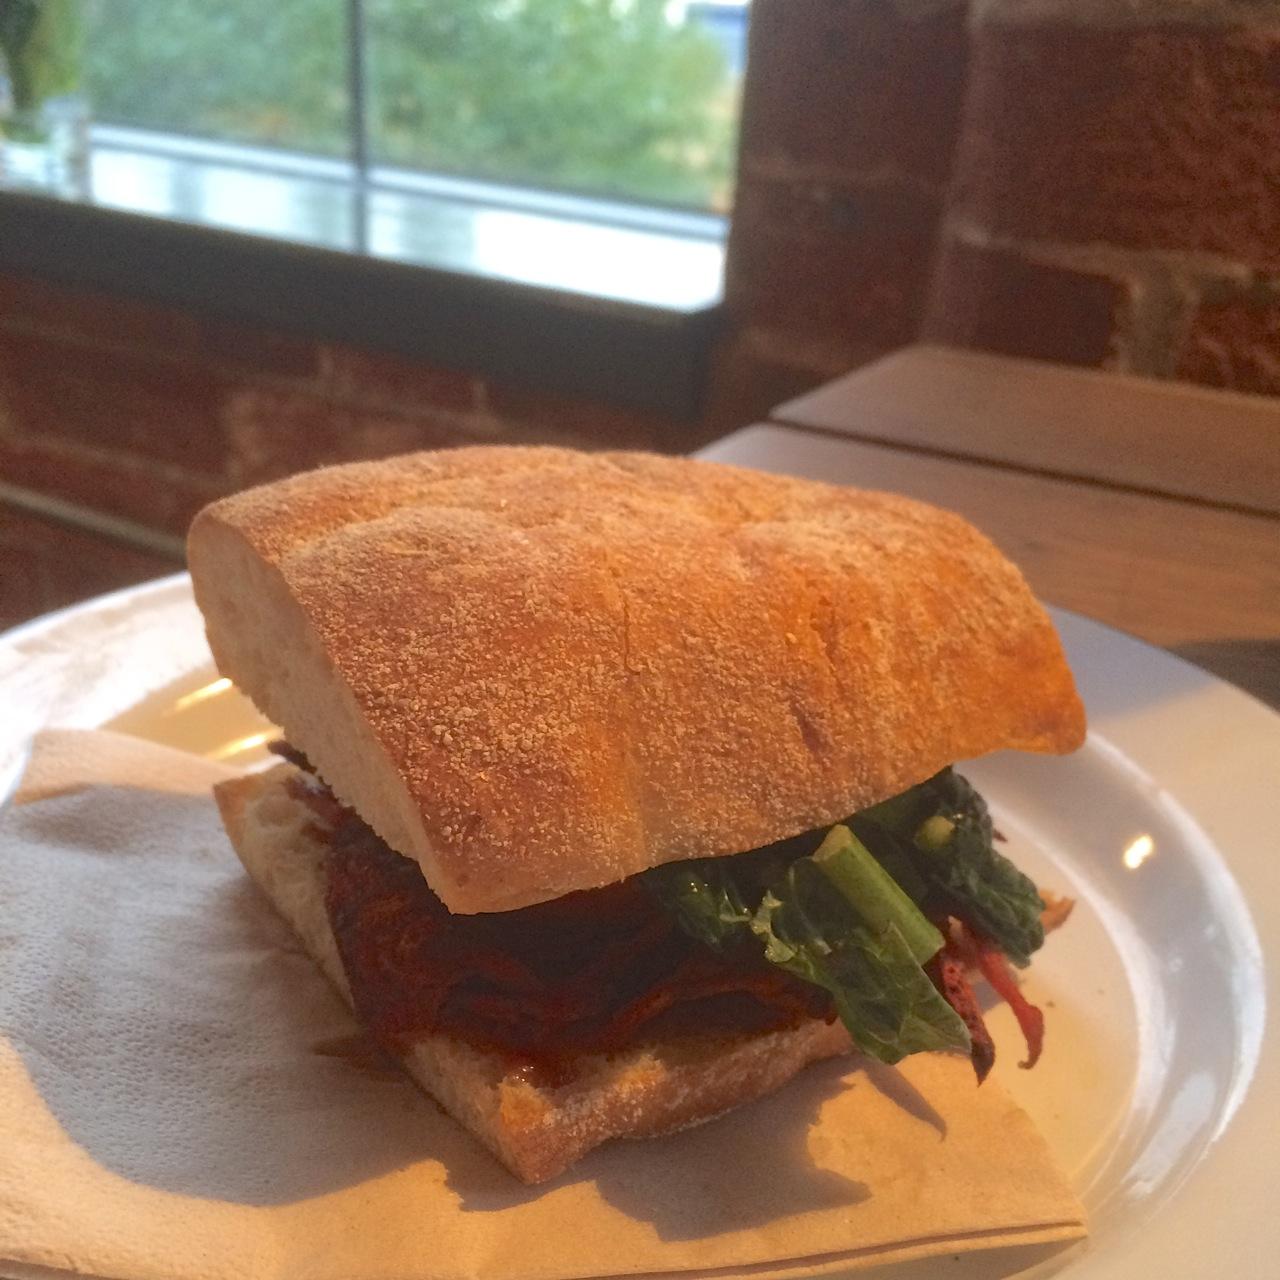 https://i2.wp.com/fatgayvegan.com/wp-content/uploads/2015/11/Sandwich-vegan.jpg?fit=1280%2C1280